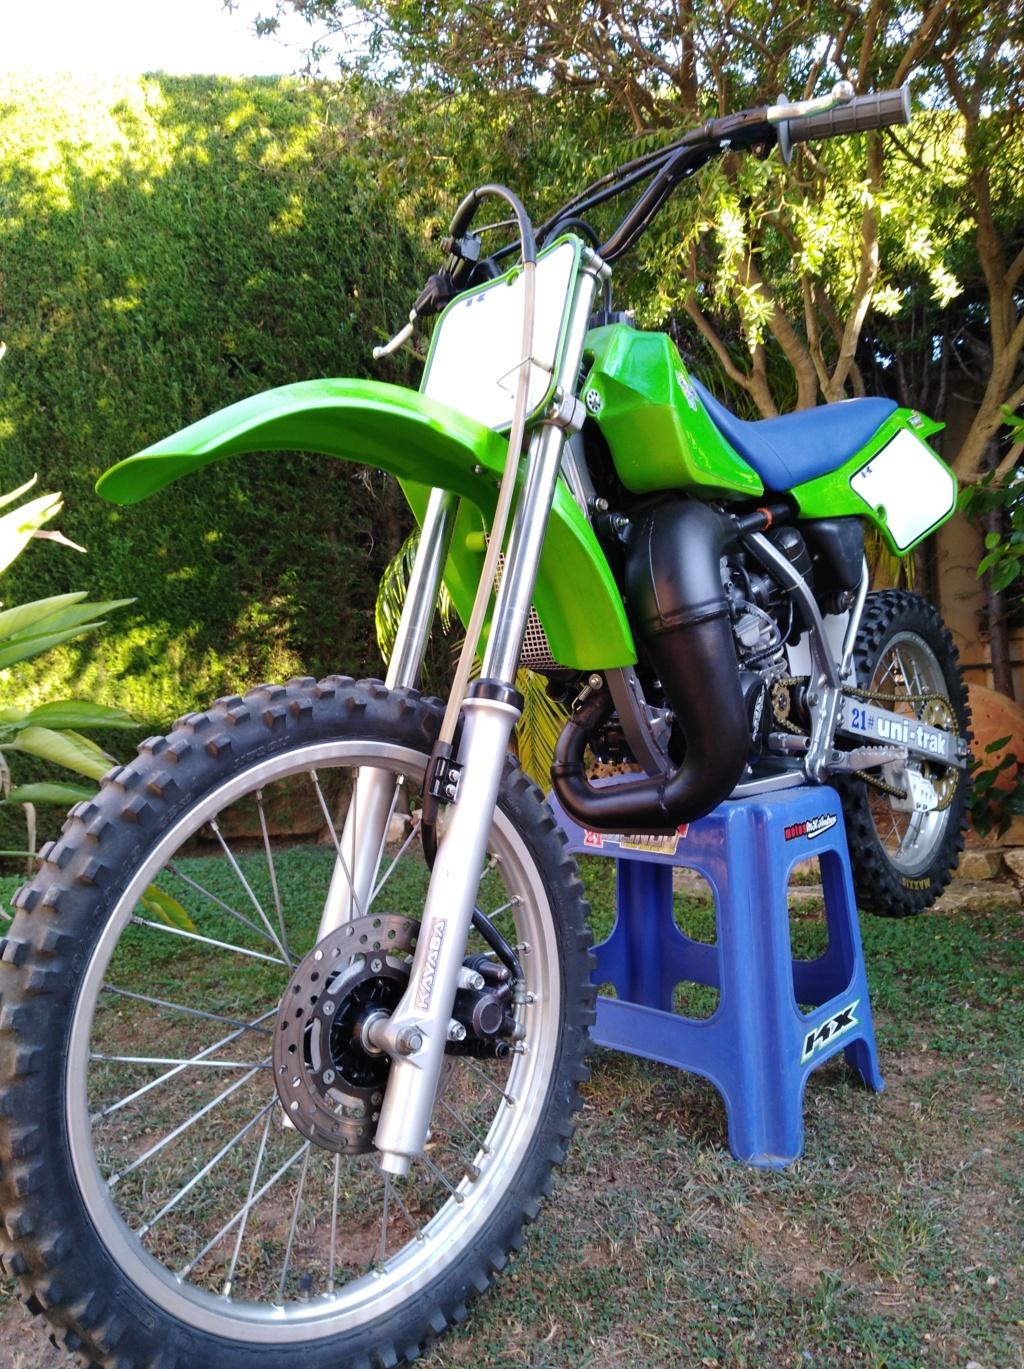 Kawasaki KX 80 1987 > Restauracion - Página 2 Img_2057